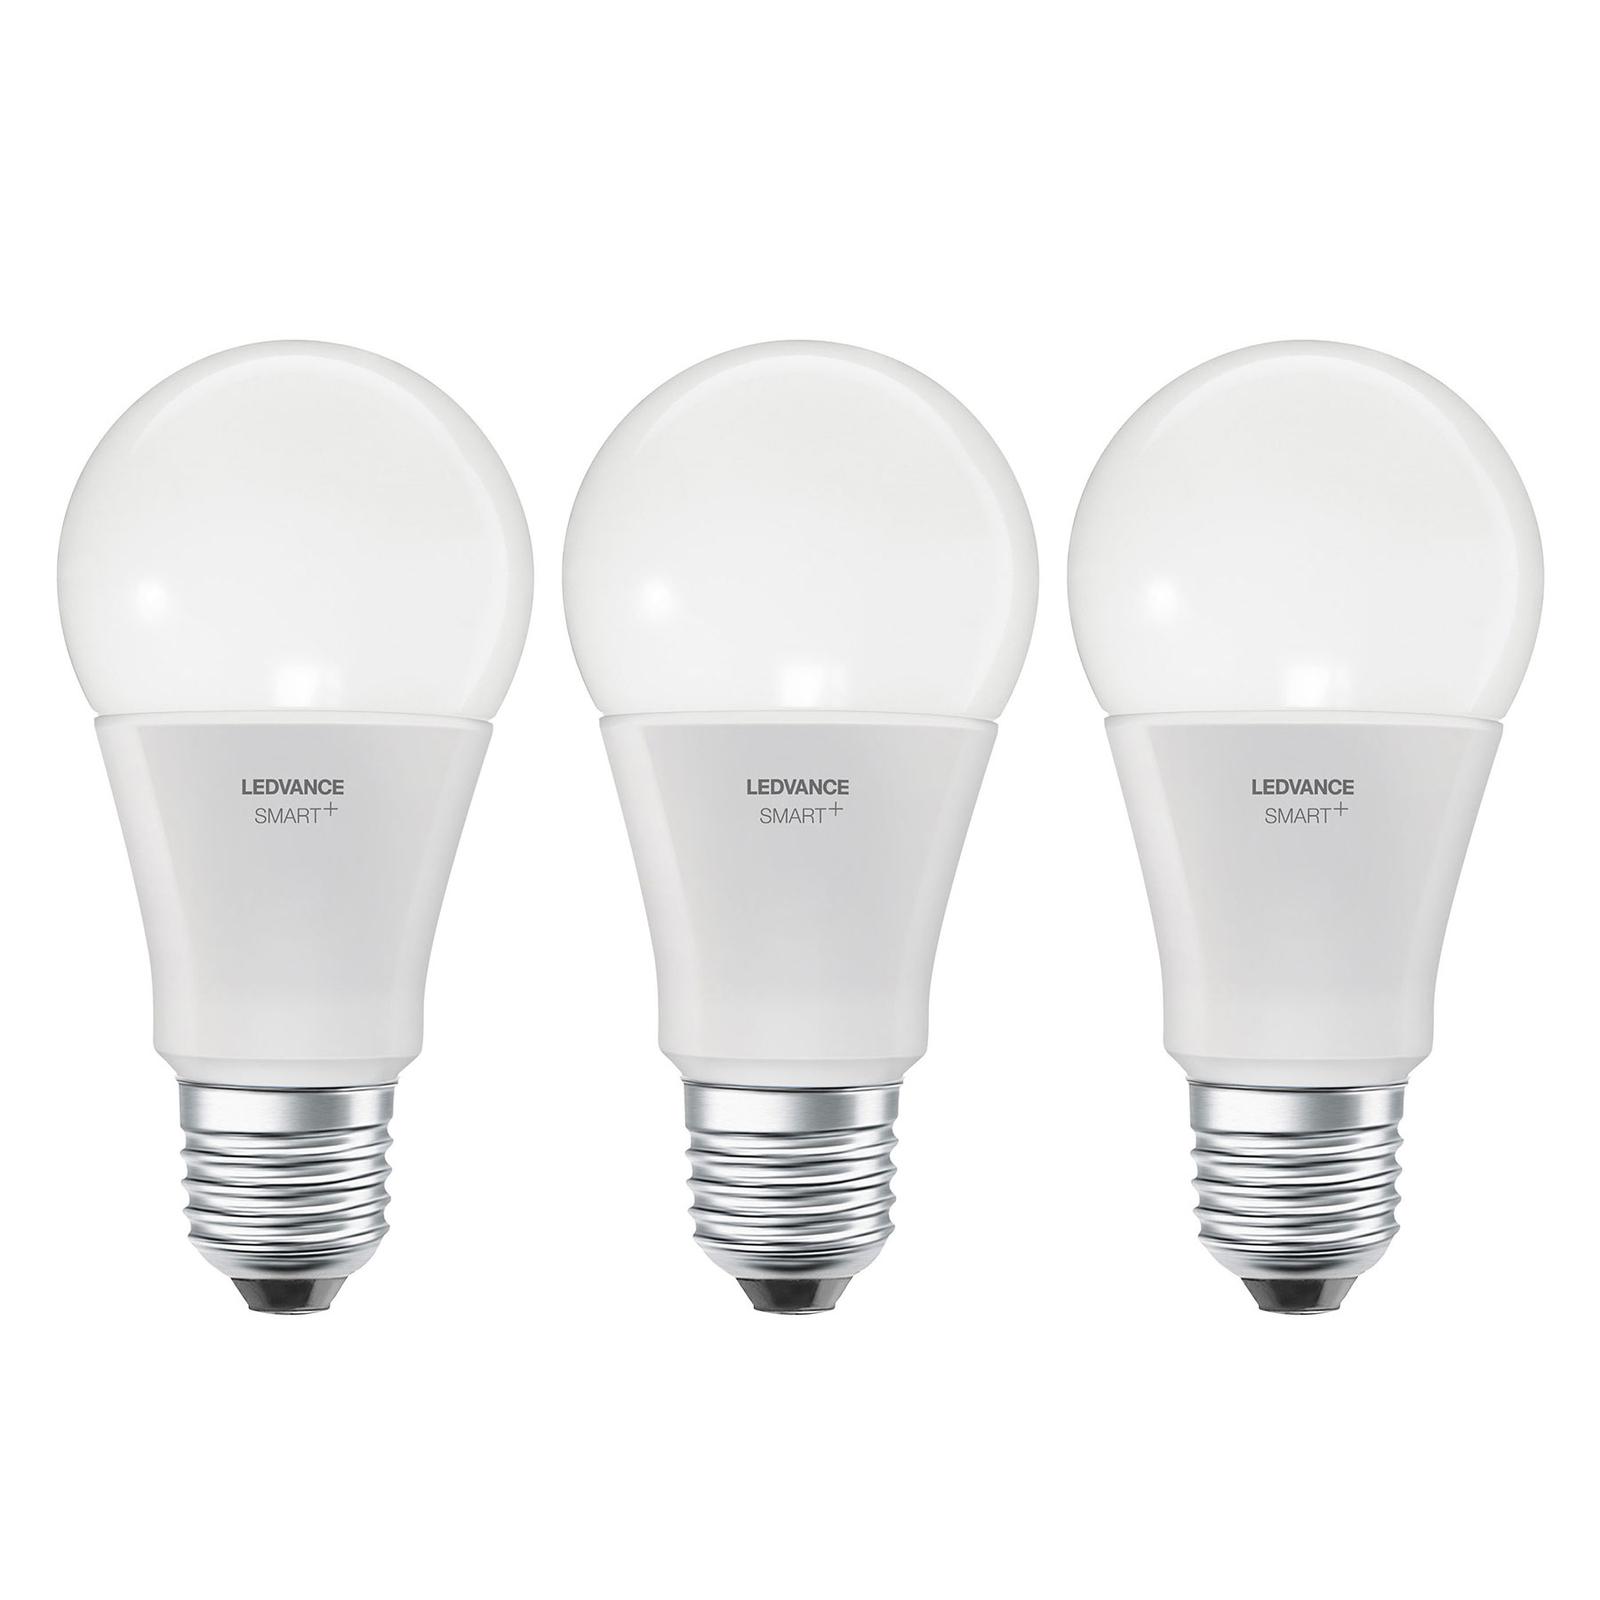 LEDVANCE SMART+ WiFi E27 9,5W Classic CCT 3szt.